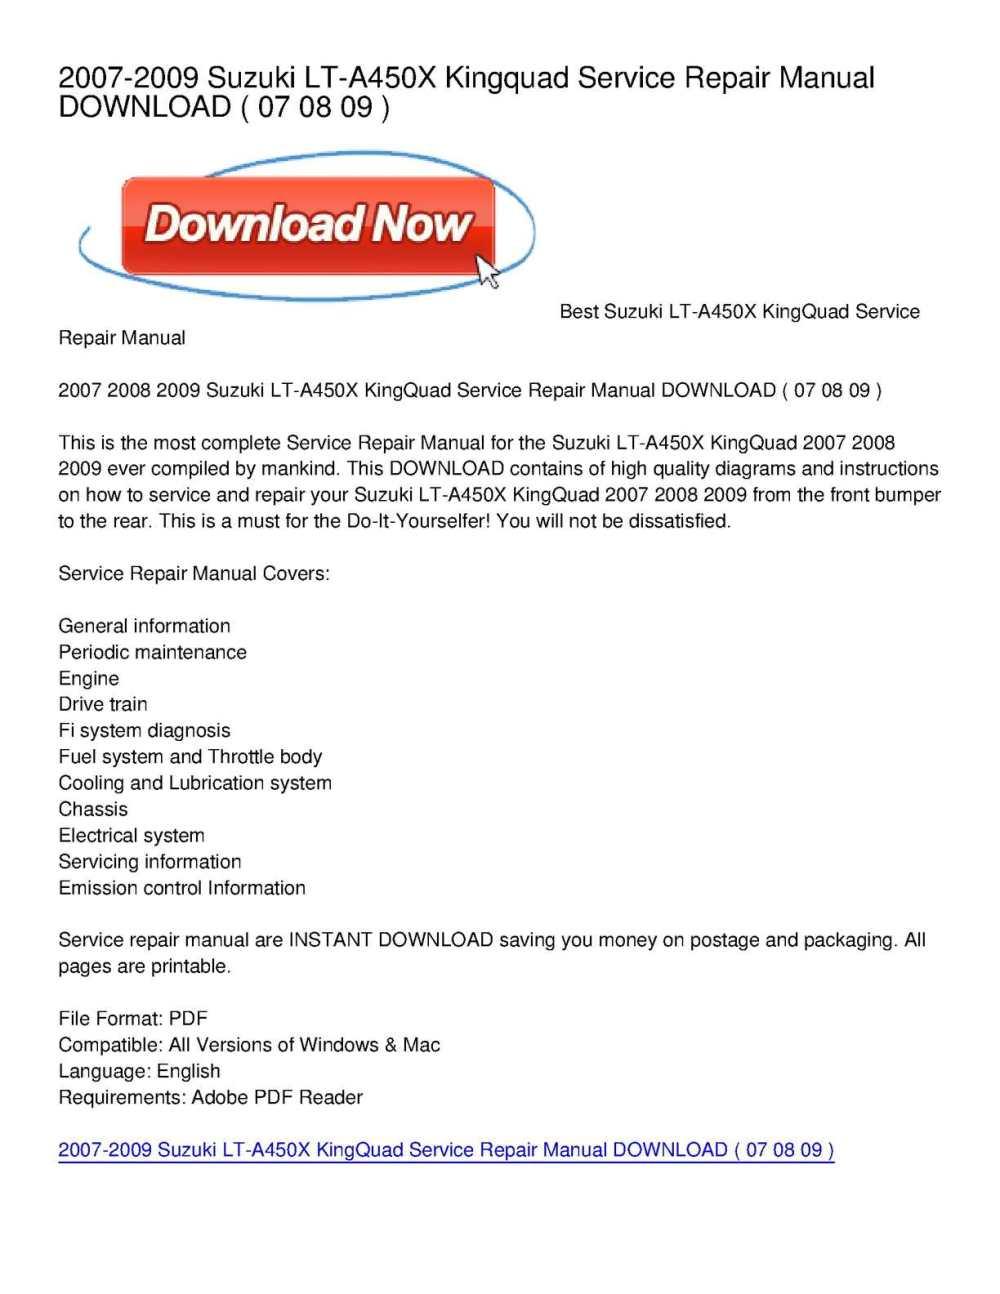 medium resolution of calam o 2007 2009 suzuki lt a450x kingquad service repair manual download